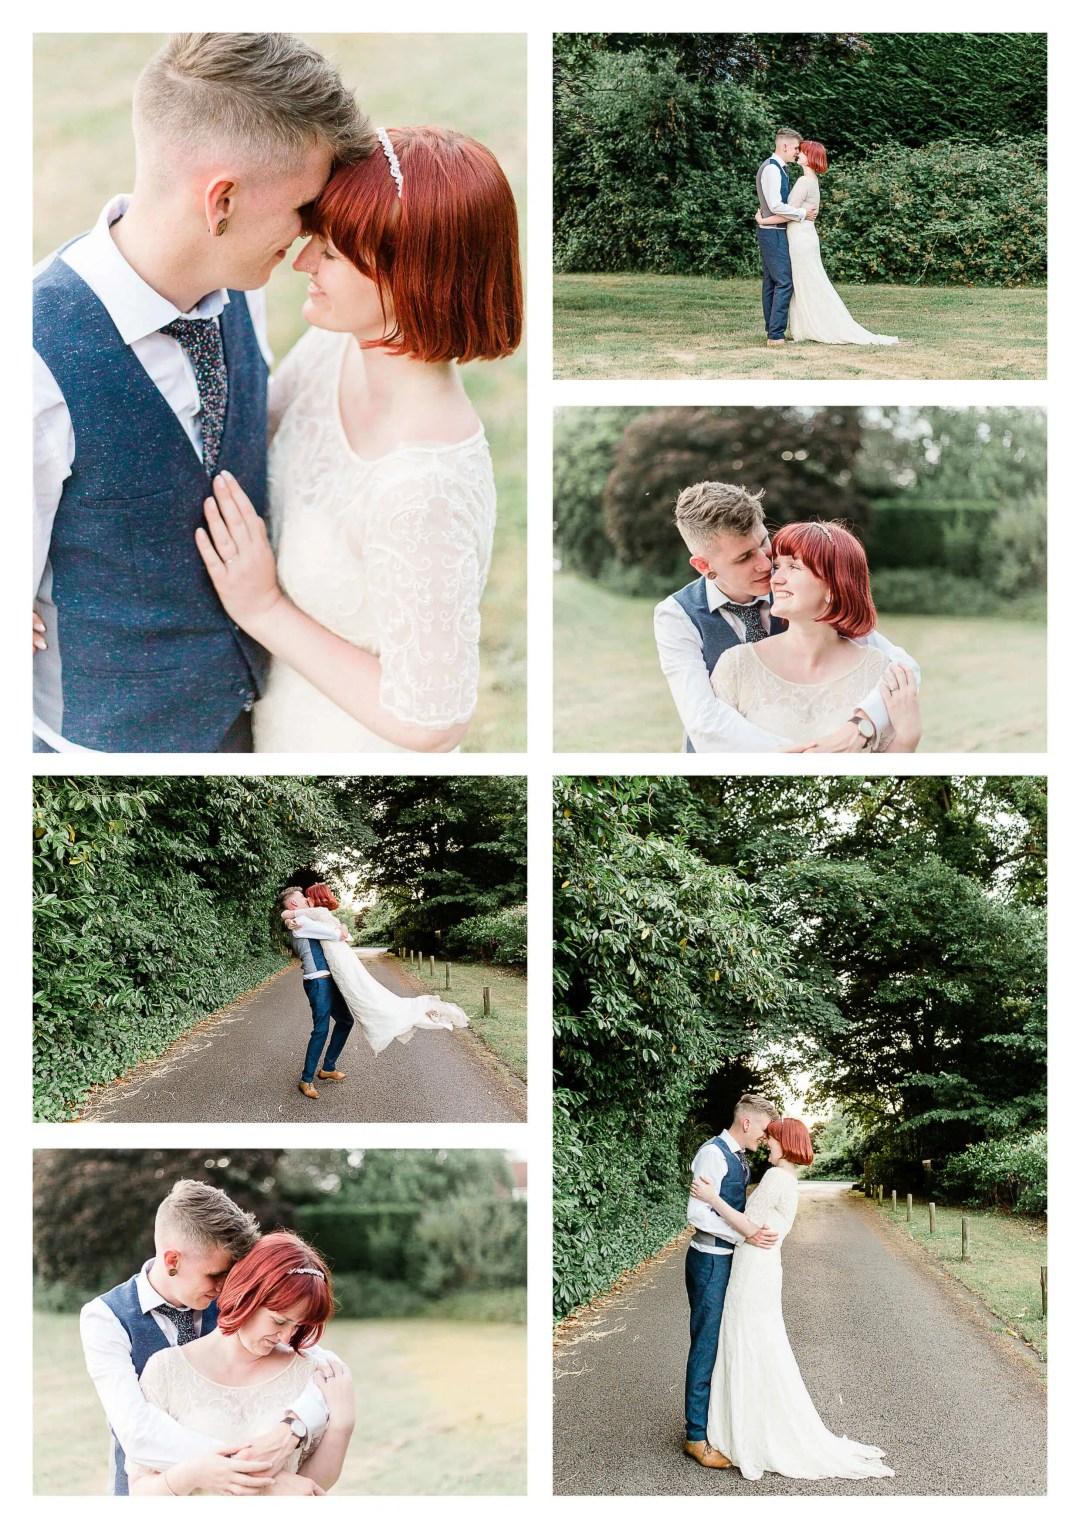 Worplesdon Memorial Hall Couple Portraits | Guildford Wedding Photographer